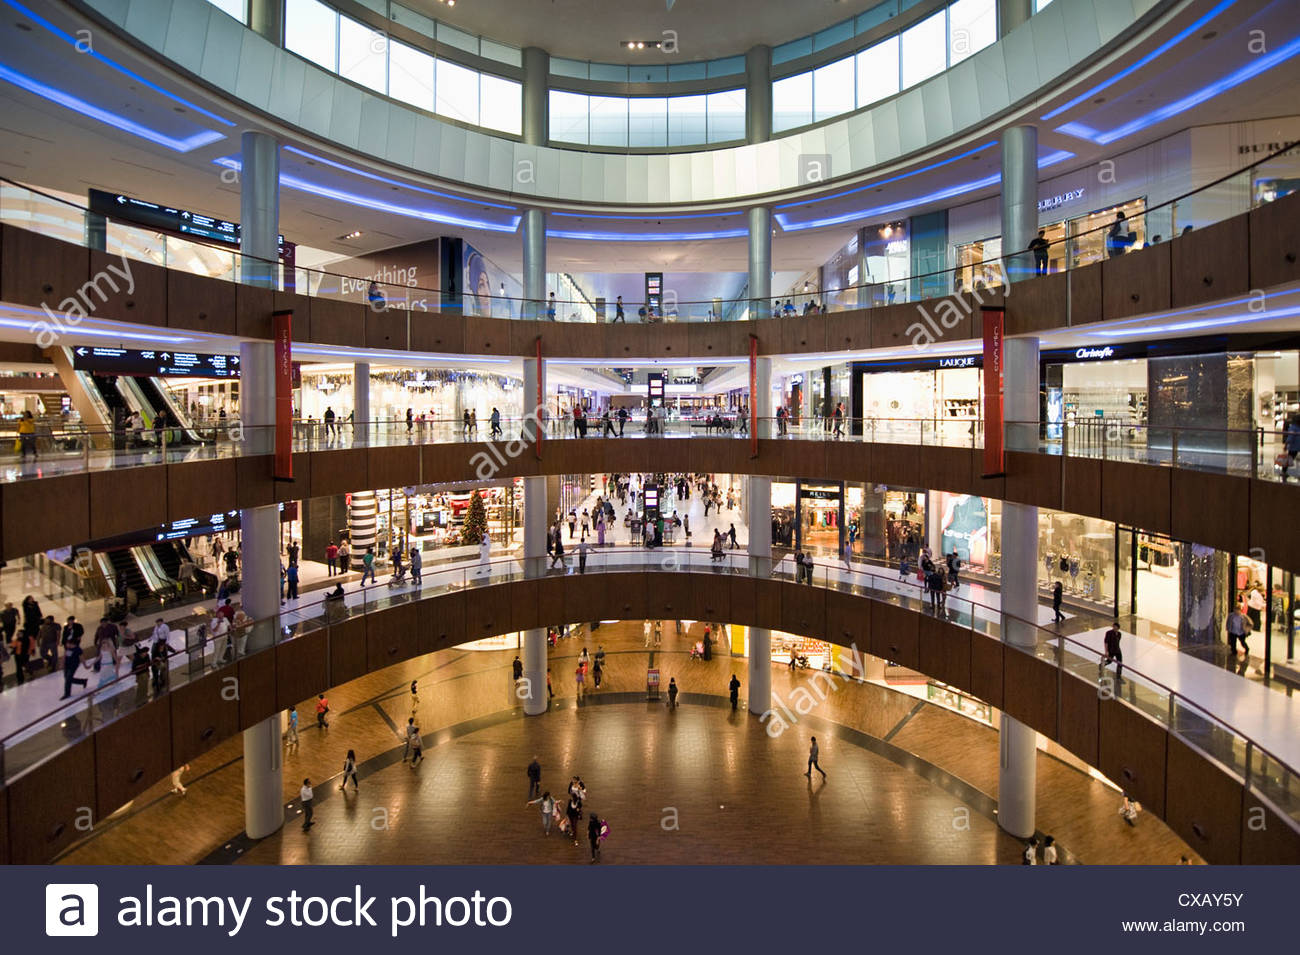 Dubai Mall, Dubai, Vereinigte Arabische Emirate, Naher Osten Stockbild